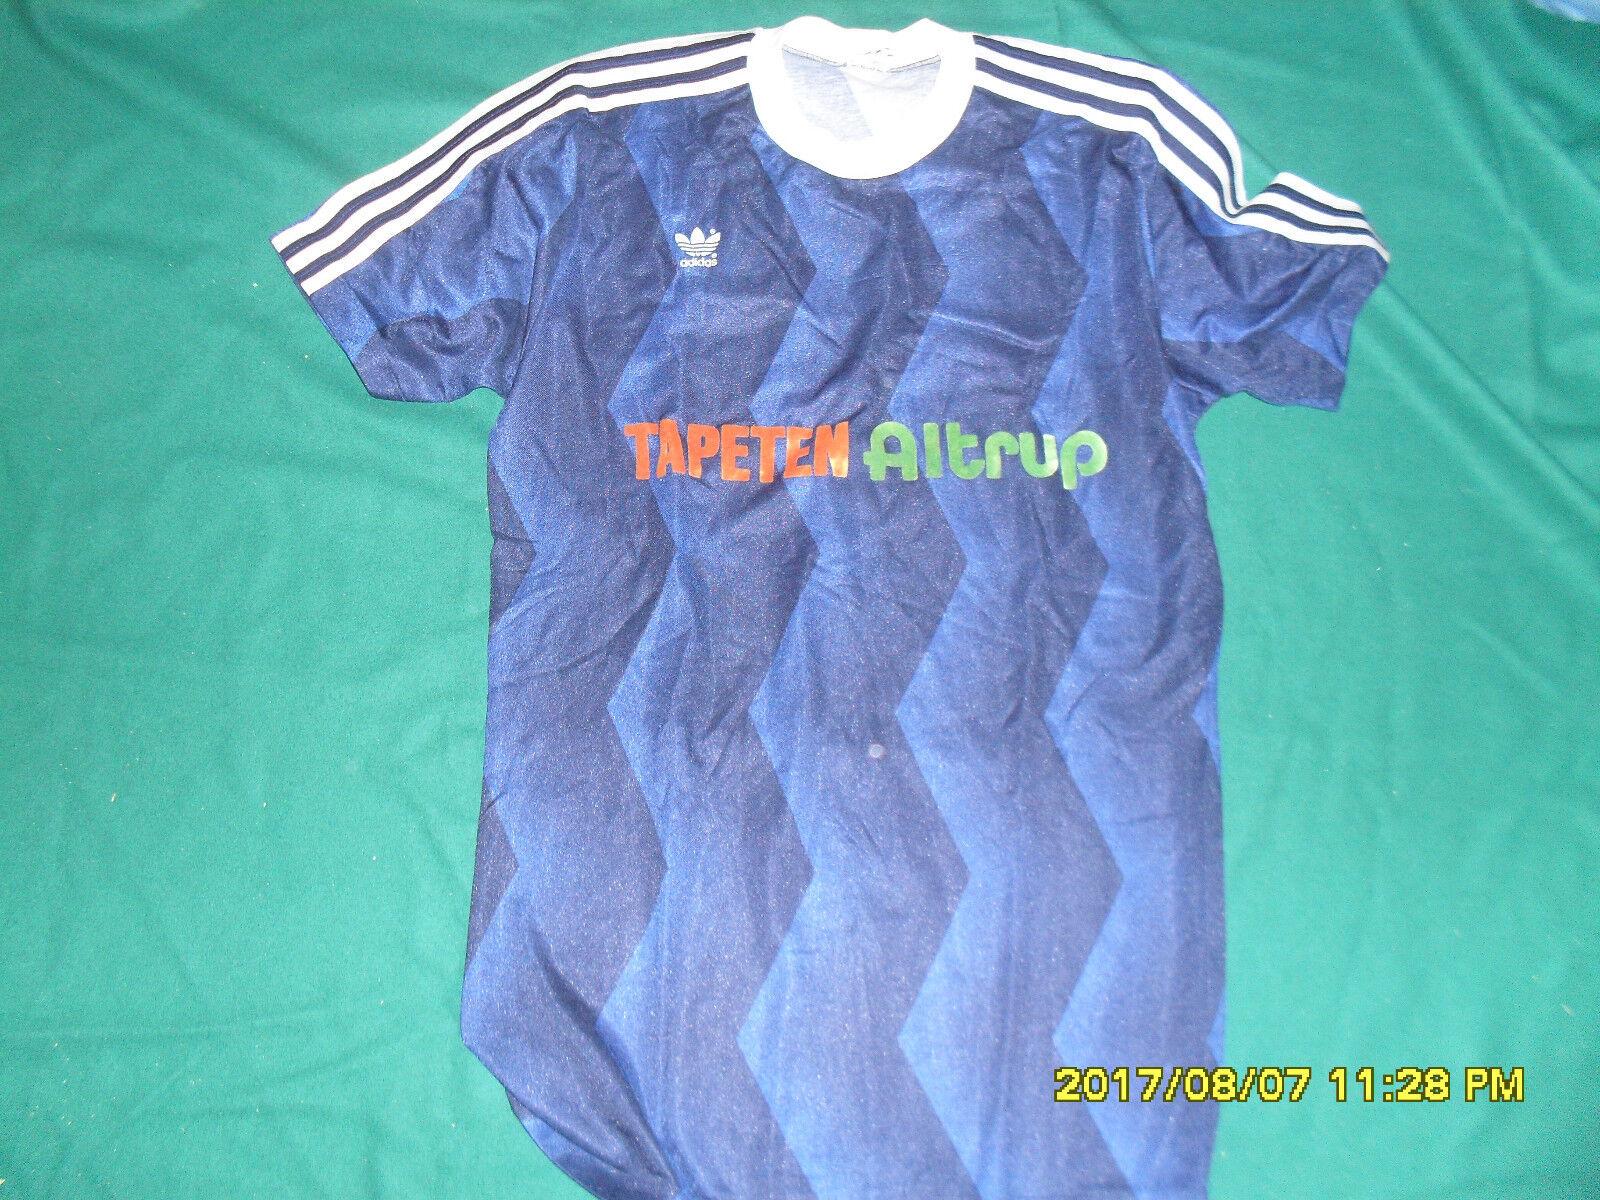 Tapeten Altrup adidas footballl shirt vintage maglia fussball trikot Jersey